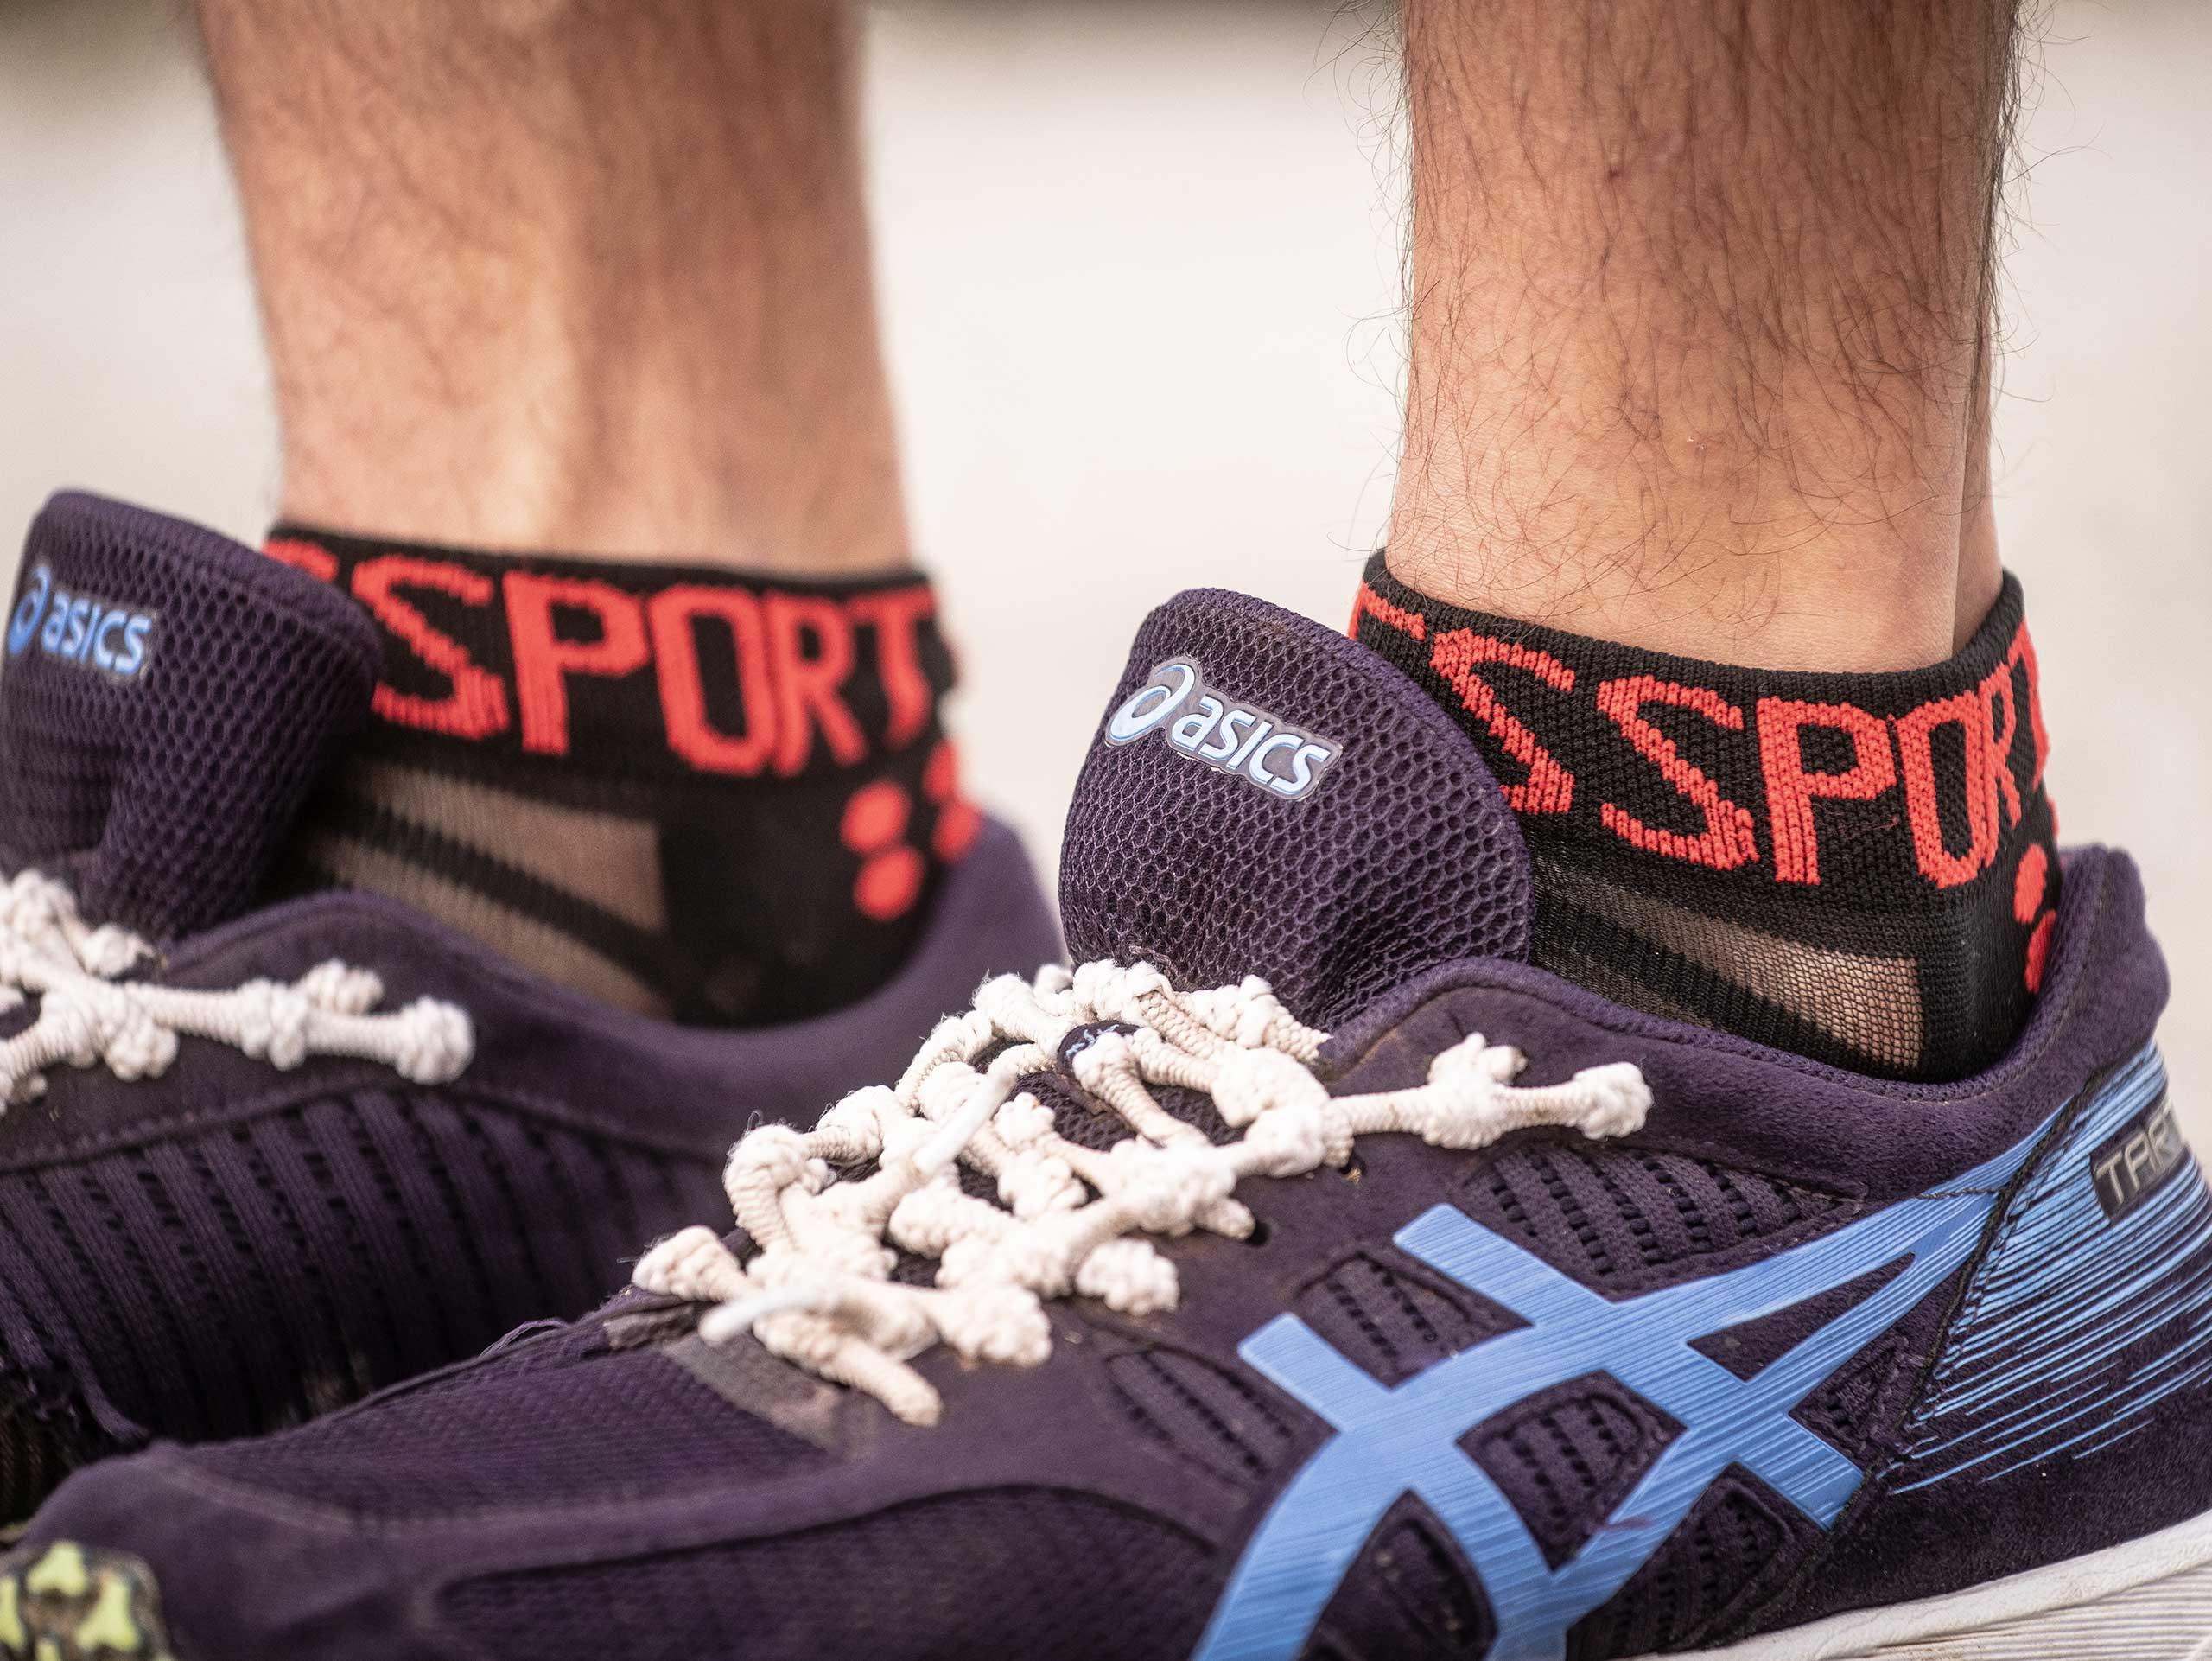 Pro Racing Socks v3.0 Ultralight Run Low noir/rouge